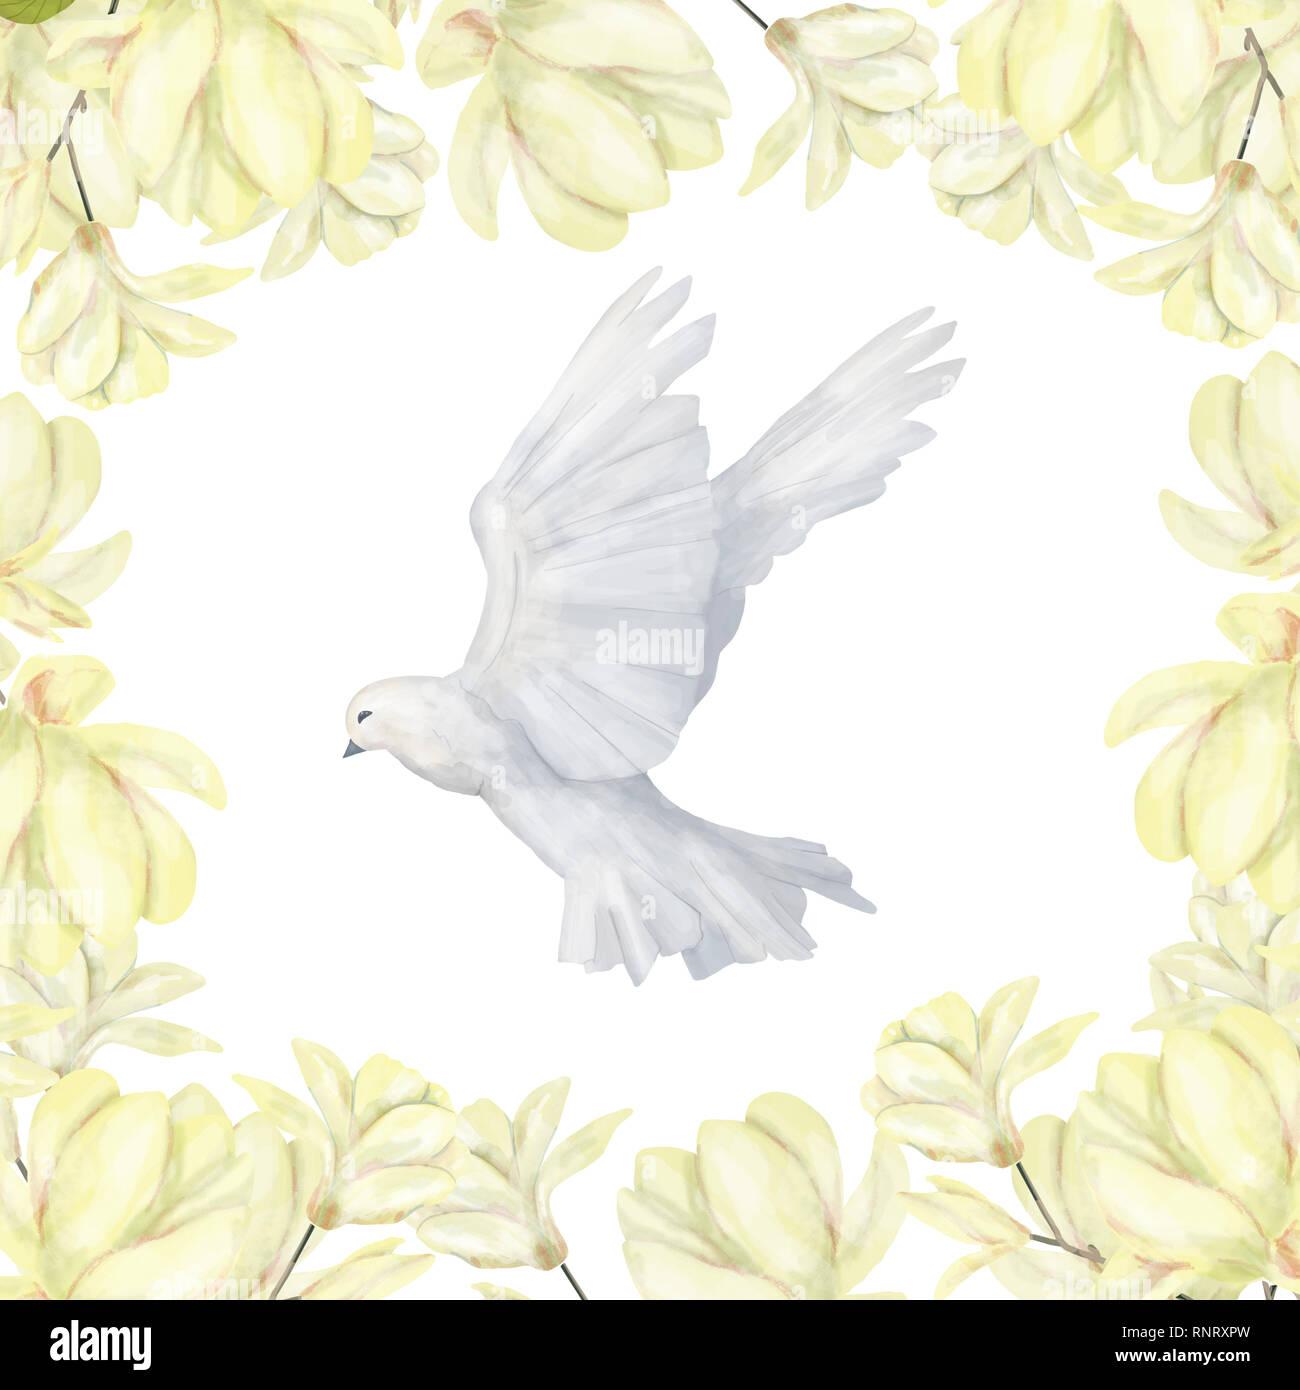 Invitation De Mariage Floral Inviter Card Colombe De La Paix Et